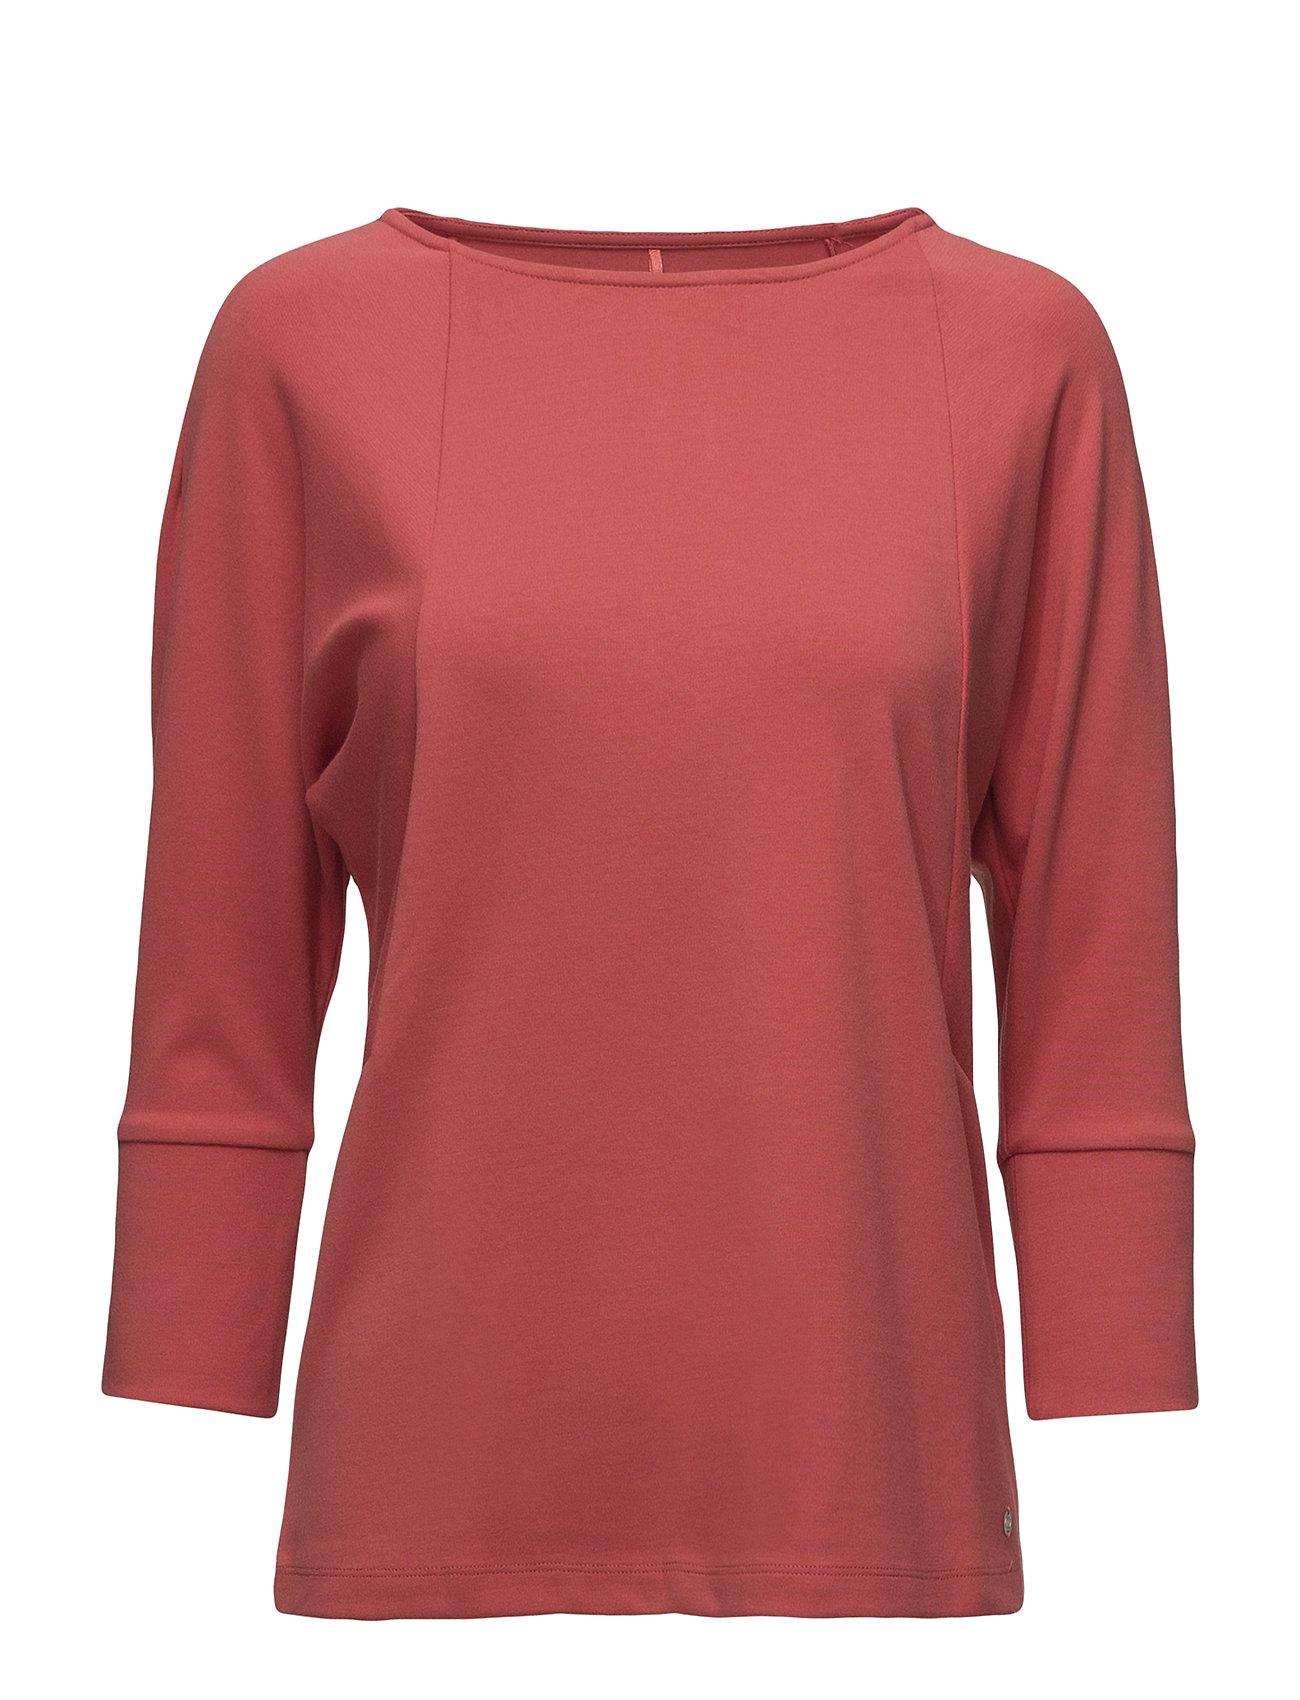 Image of T-Shirt 3/4-Sleeve R Langærmet T-shirt Lyserød GERRY WEBER EDITION (3054539905)